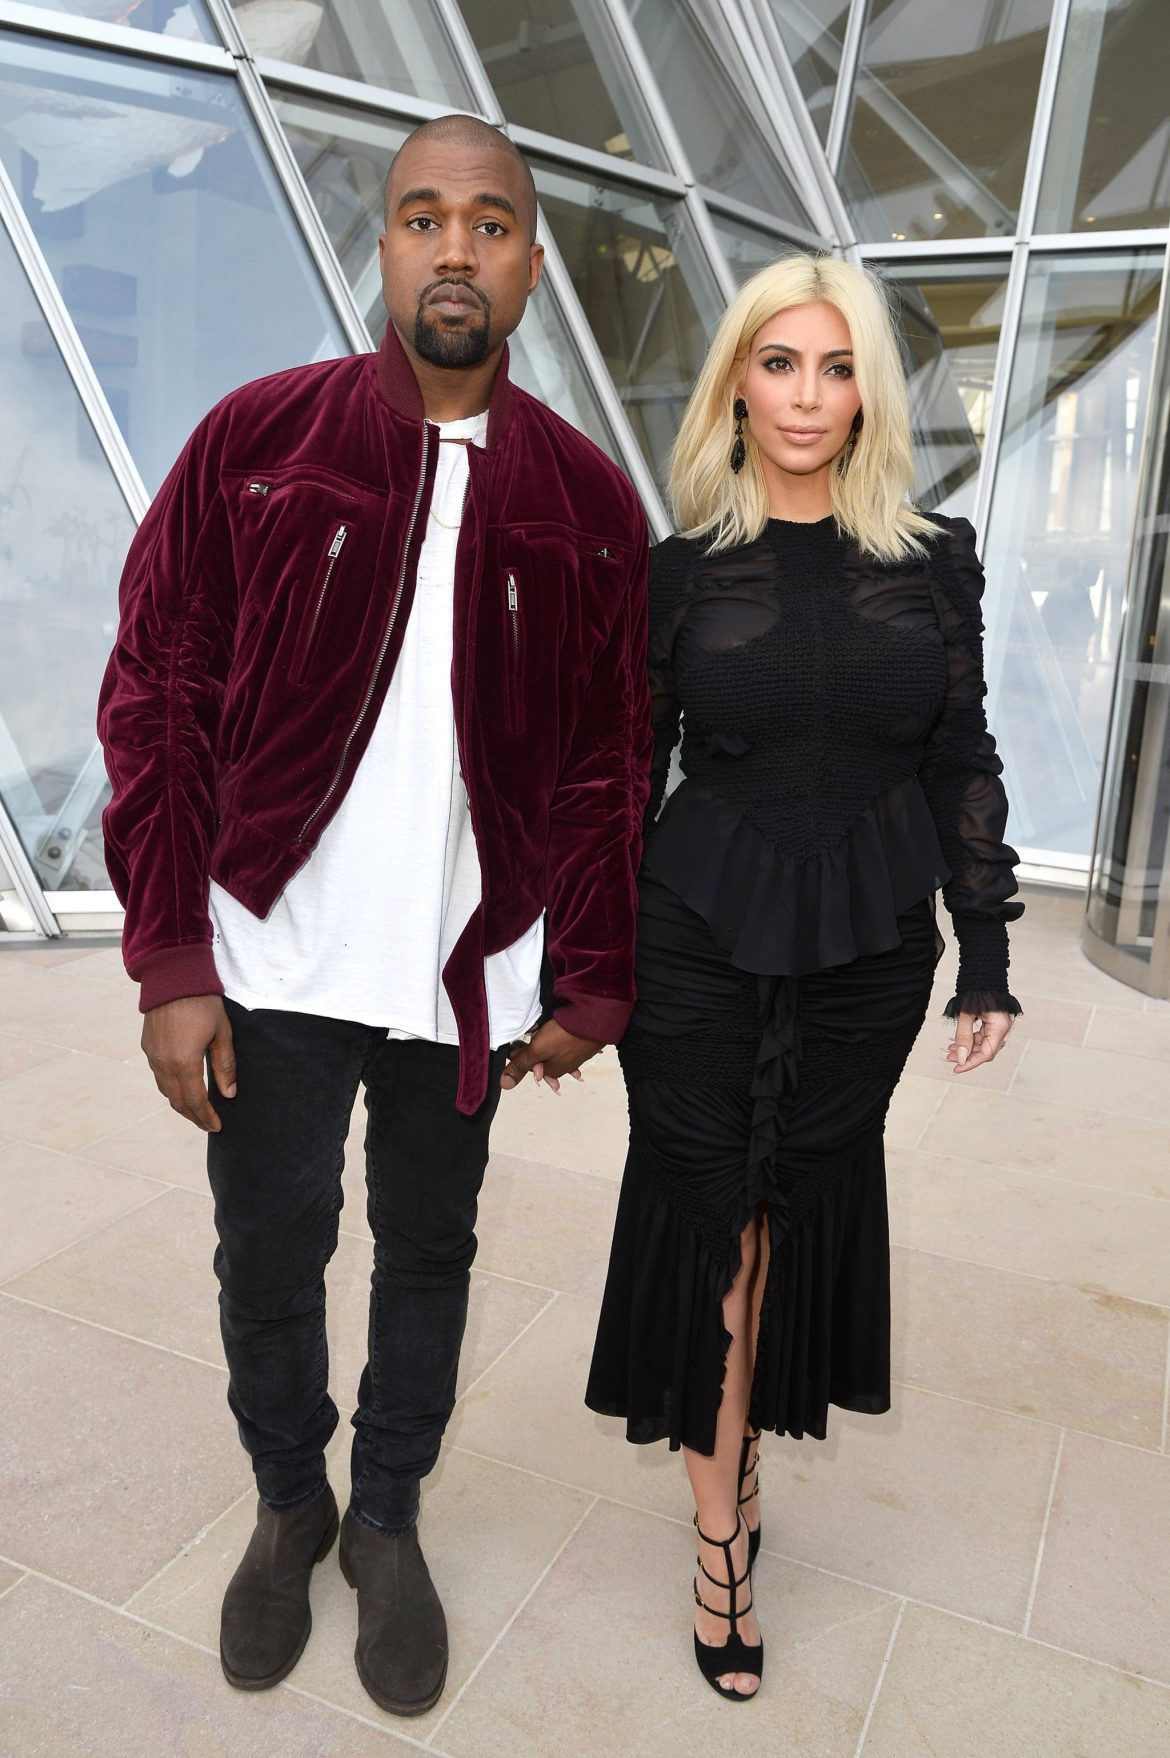 Kanye-Contrasted-Kim-Velour-Bomber-Jacket-White-Tee